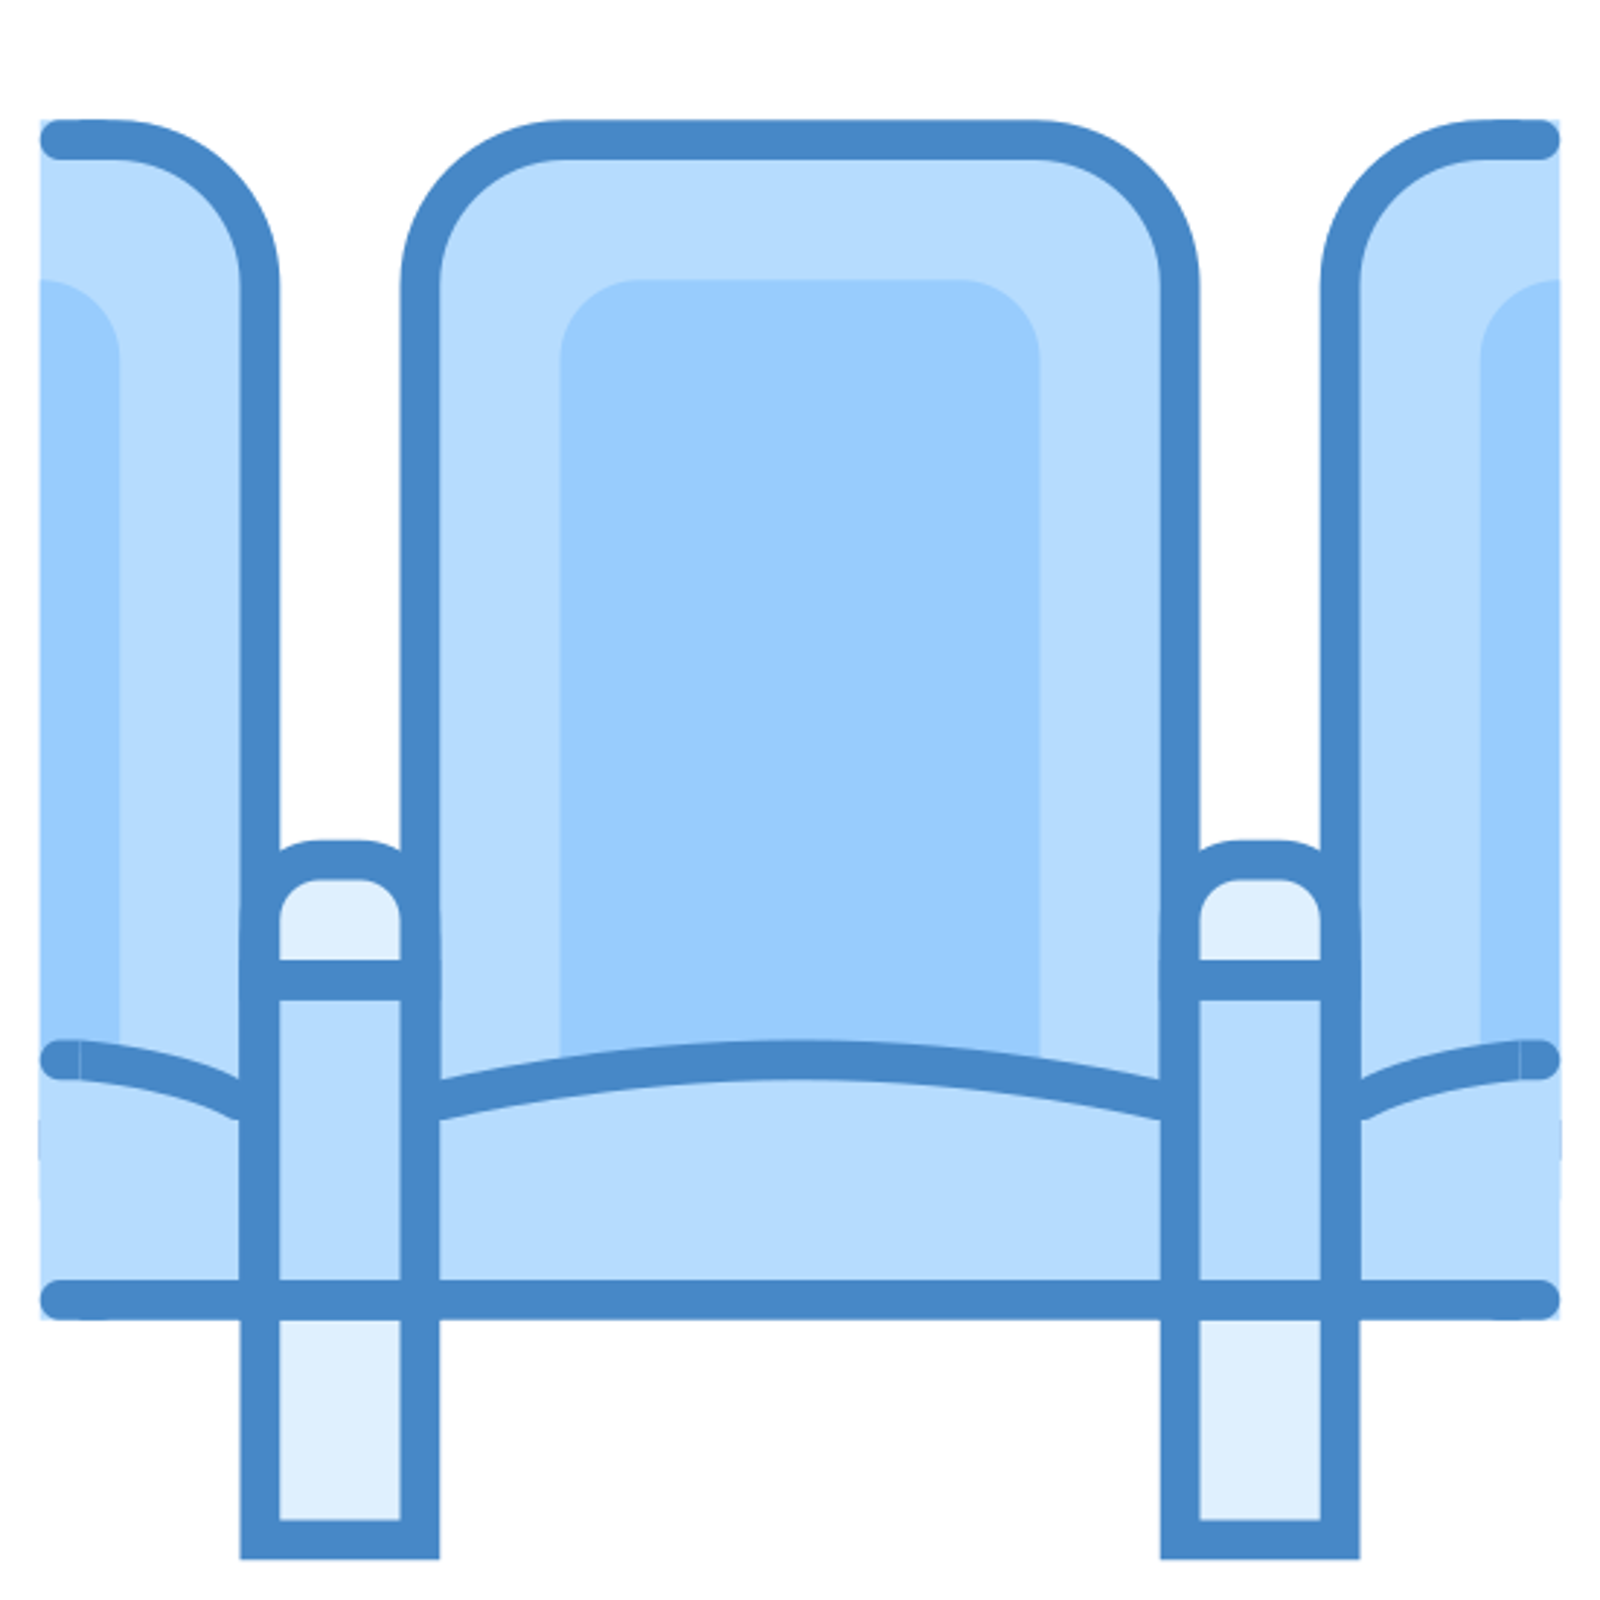 Miejsca teatralne icon